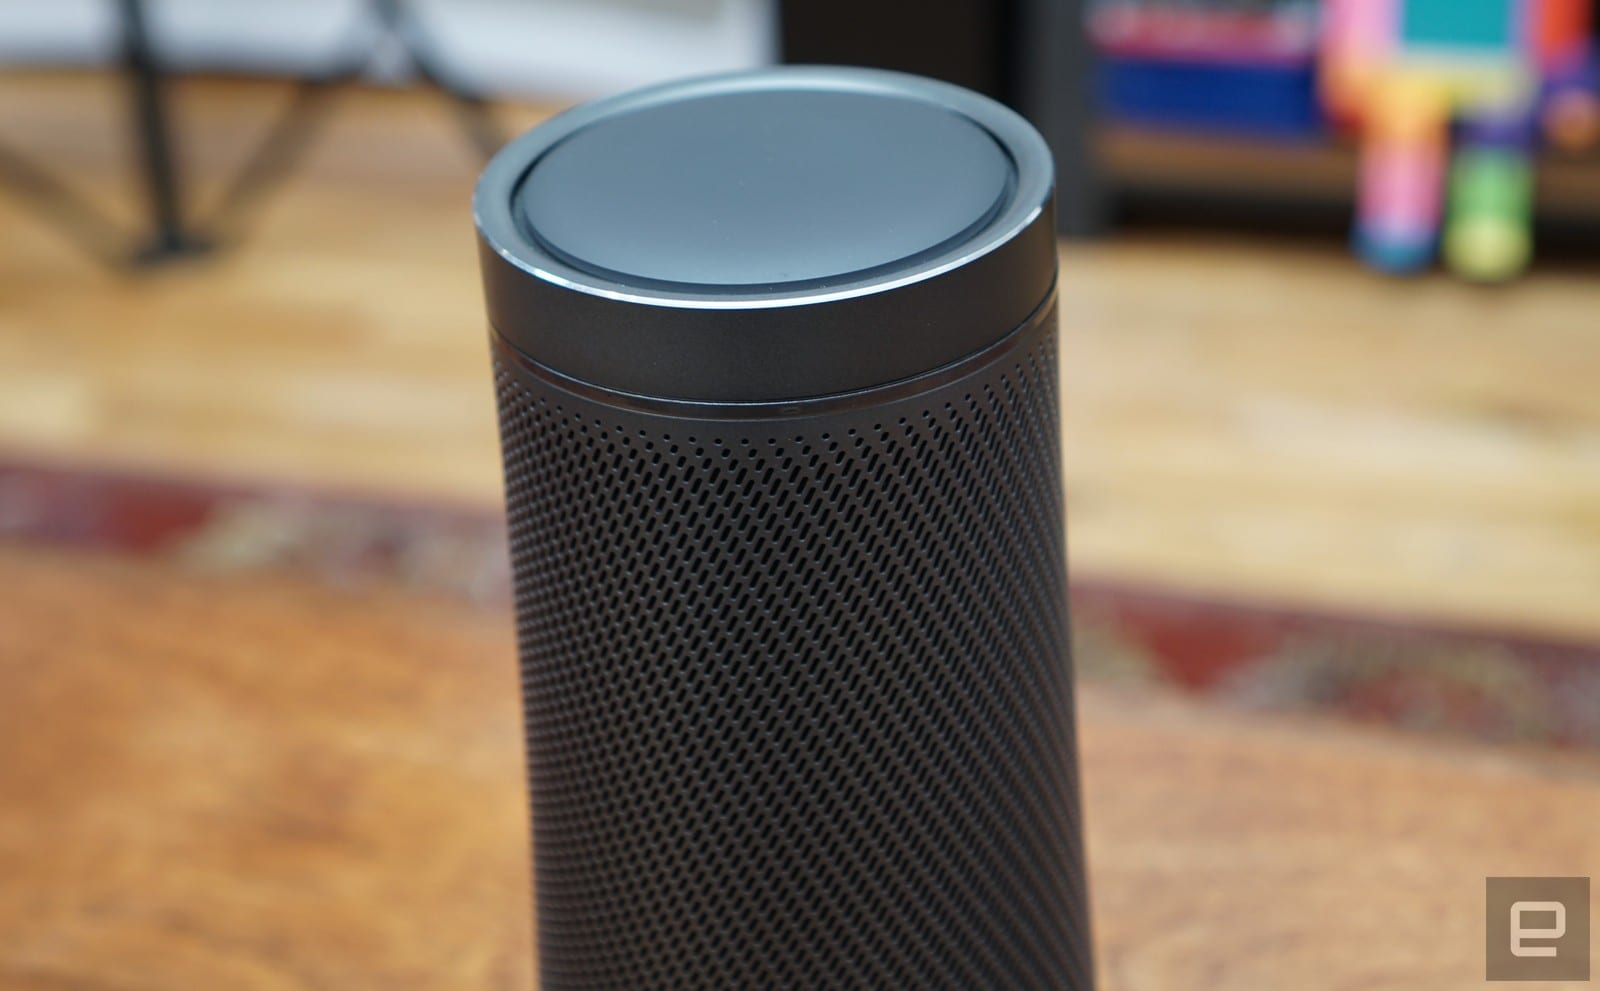 Harman Kardon Invoke review: The first Cortana speaker